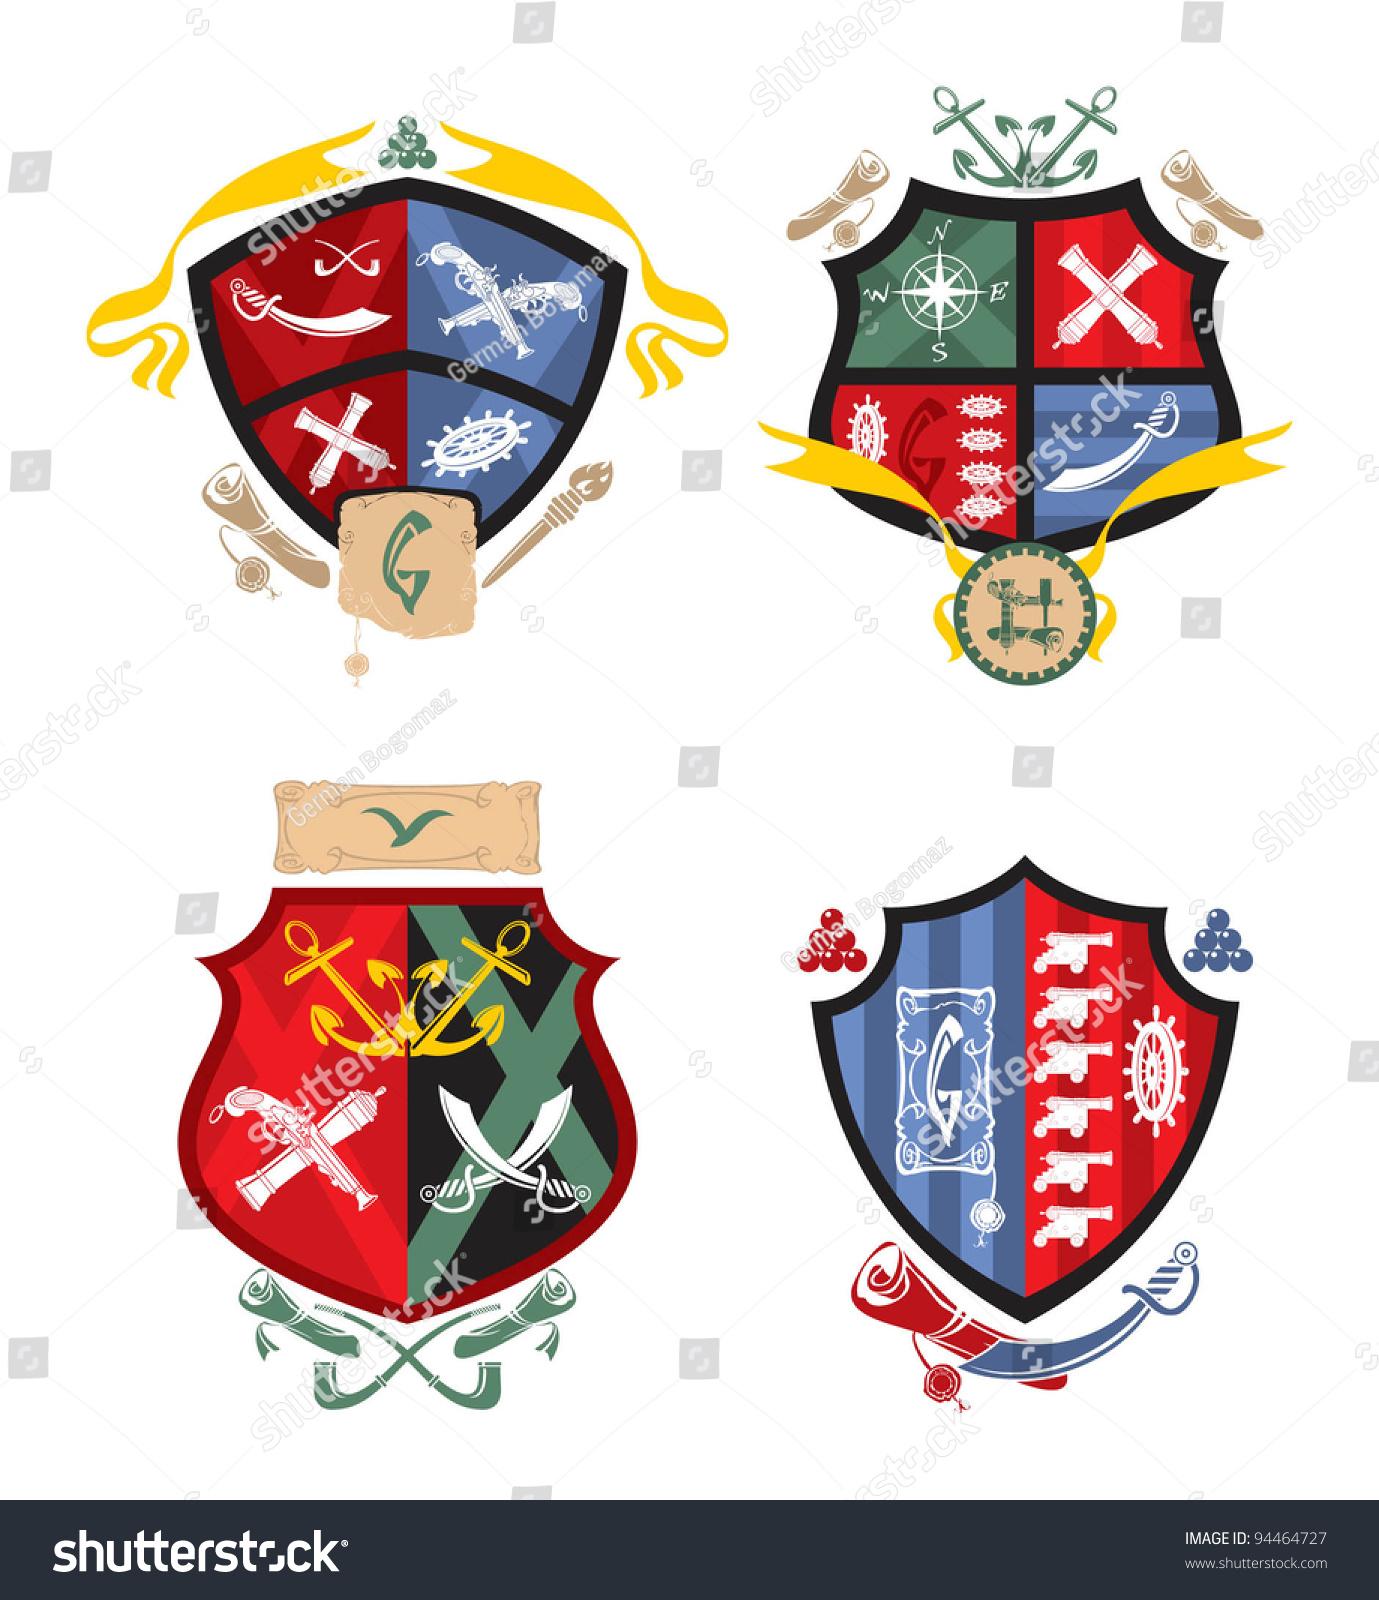 heraldry pirate naval arms 3 vector stock vector 94464727